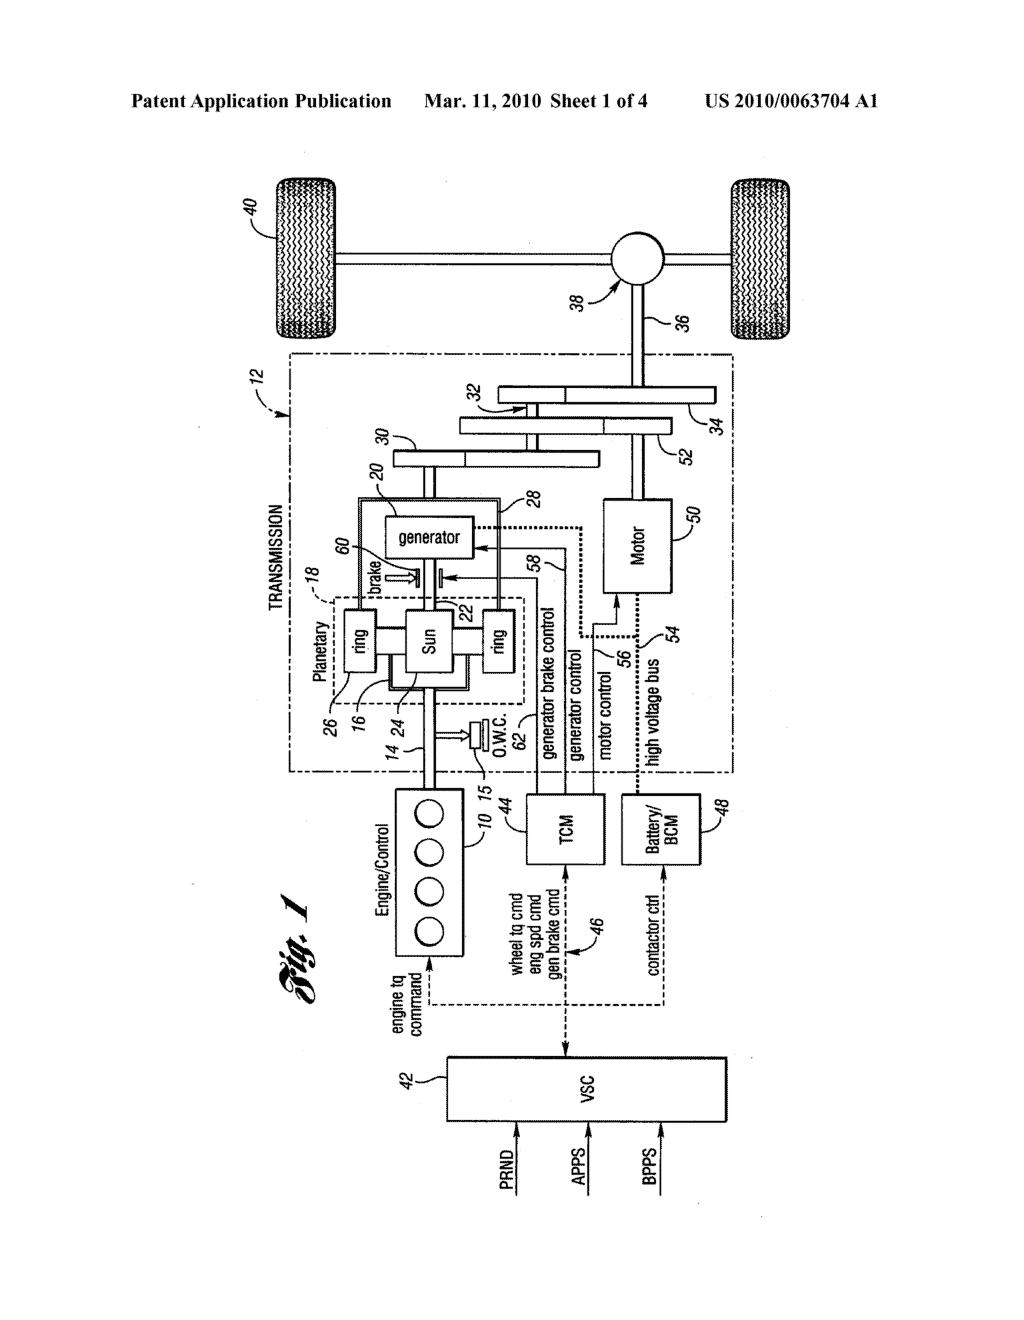 hybrid electric vehicle powertrain with enhanced reverse drive rh patentsencyclopedia com powertrain schematic diagram powertrain diagram 2006 jeep liberty